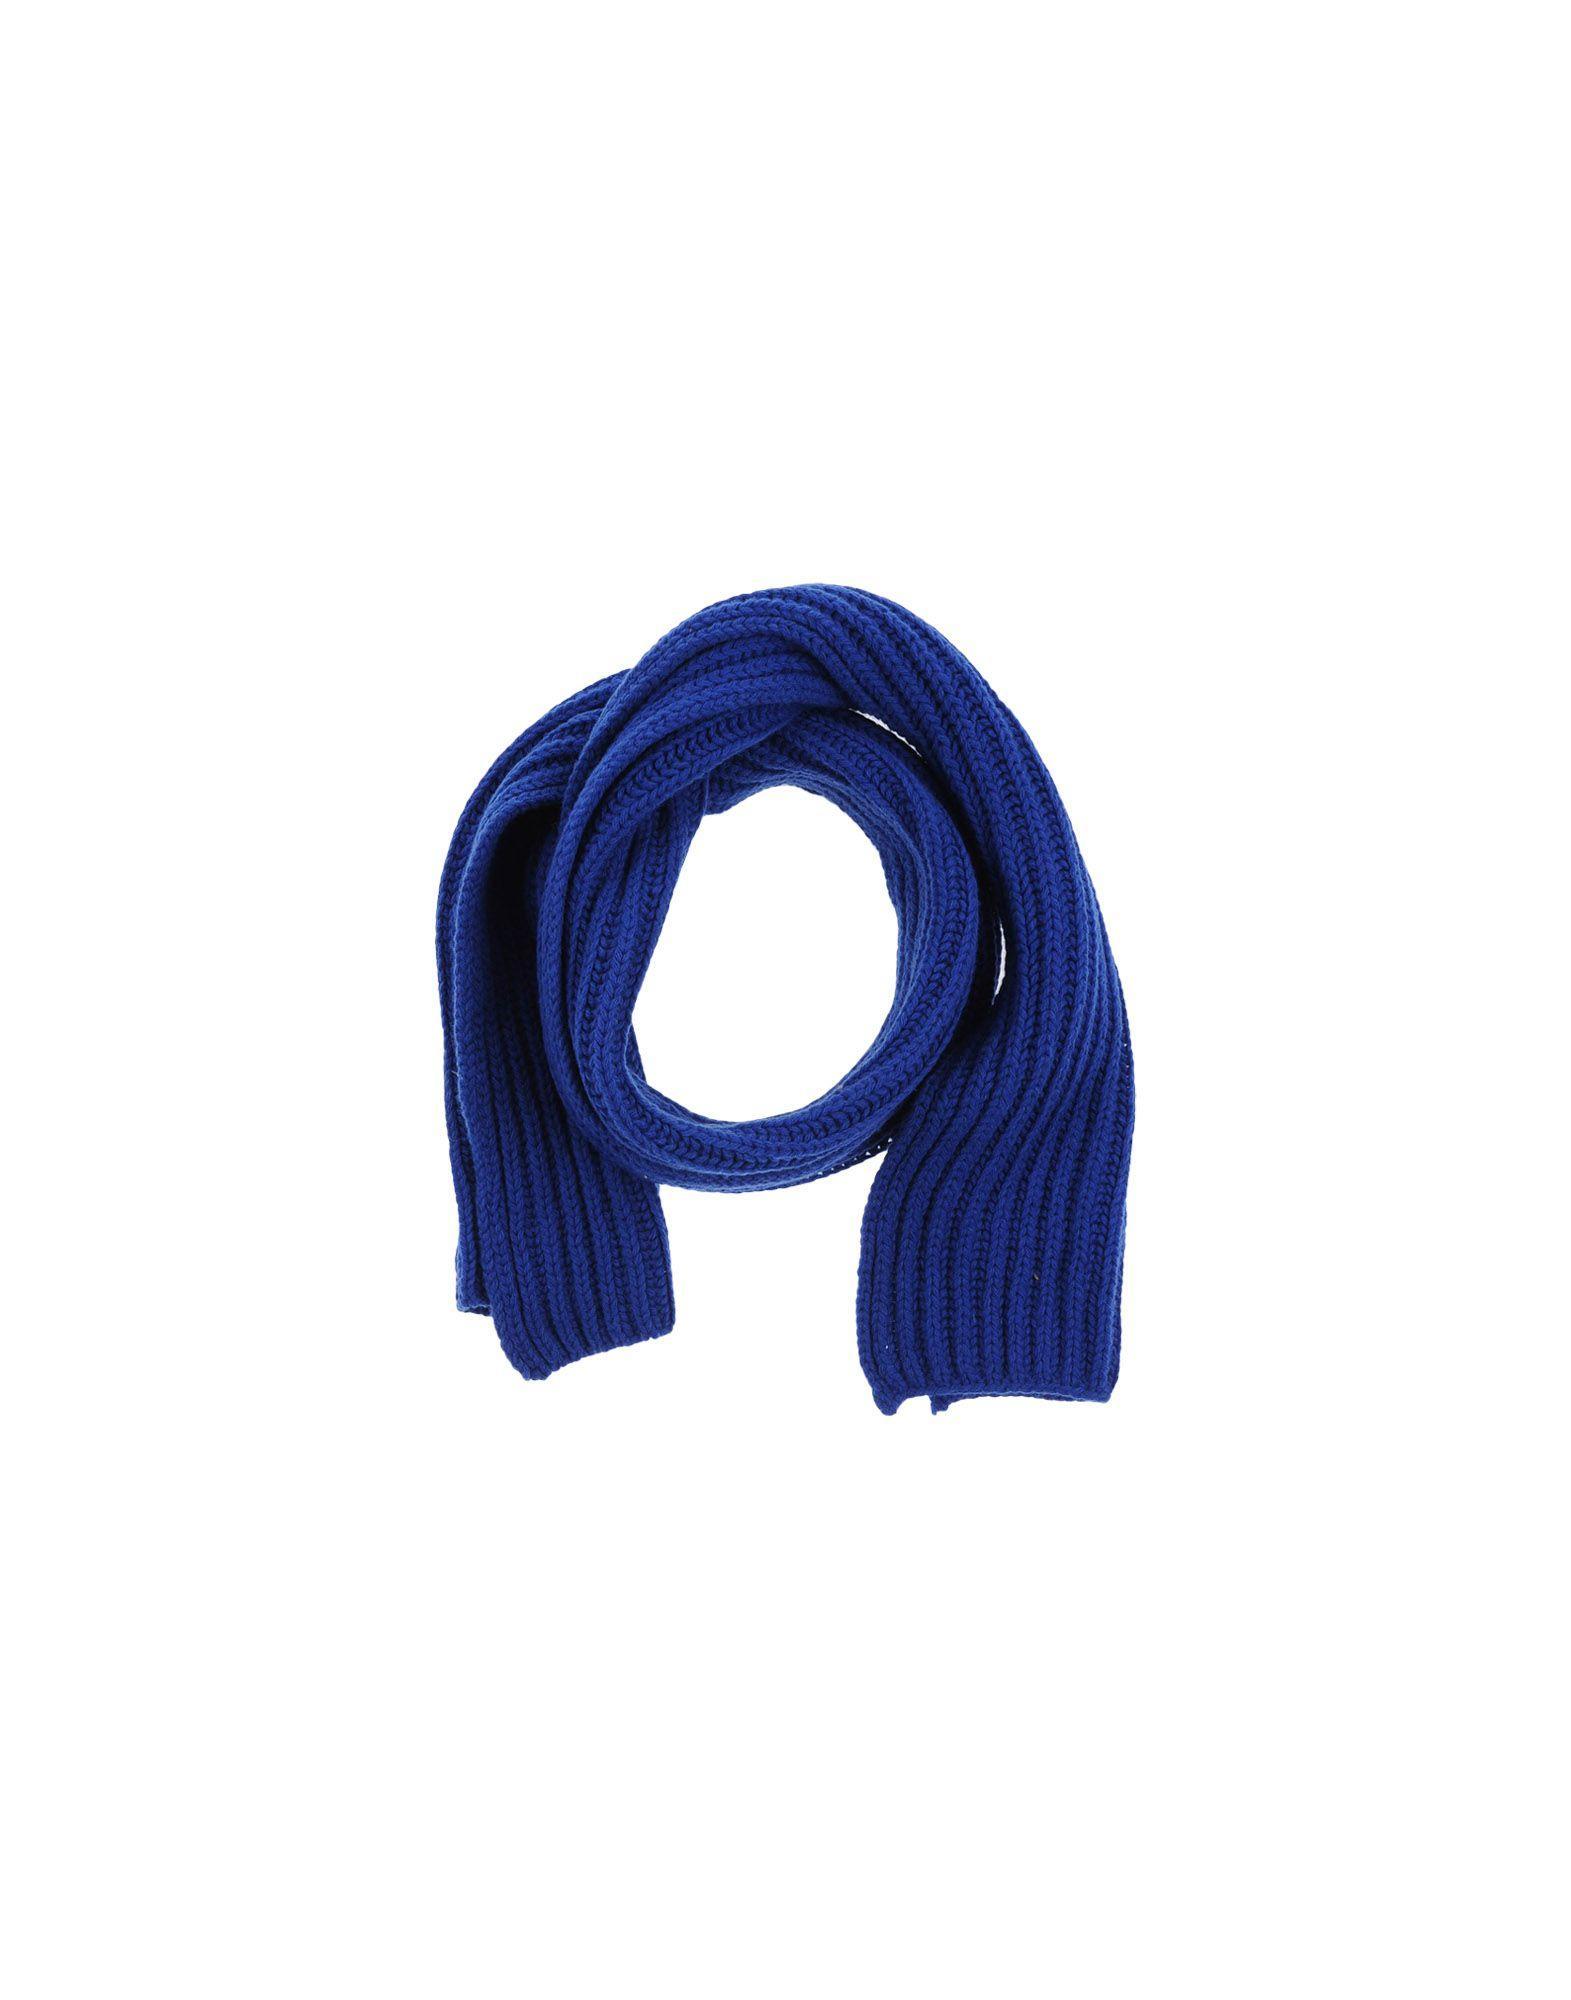 Altea Oblong Scarves In Blue